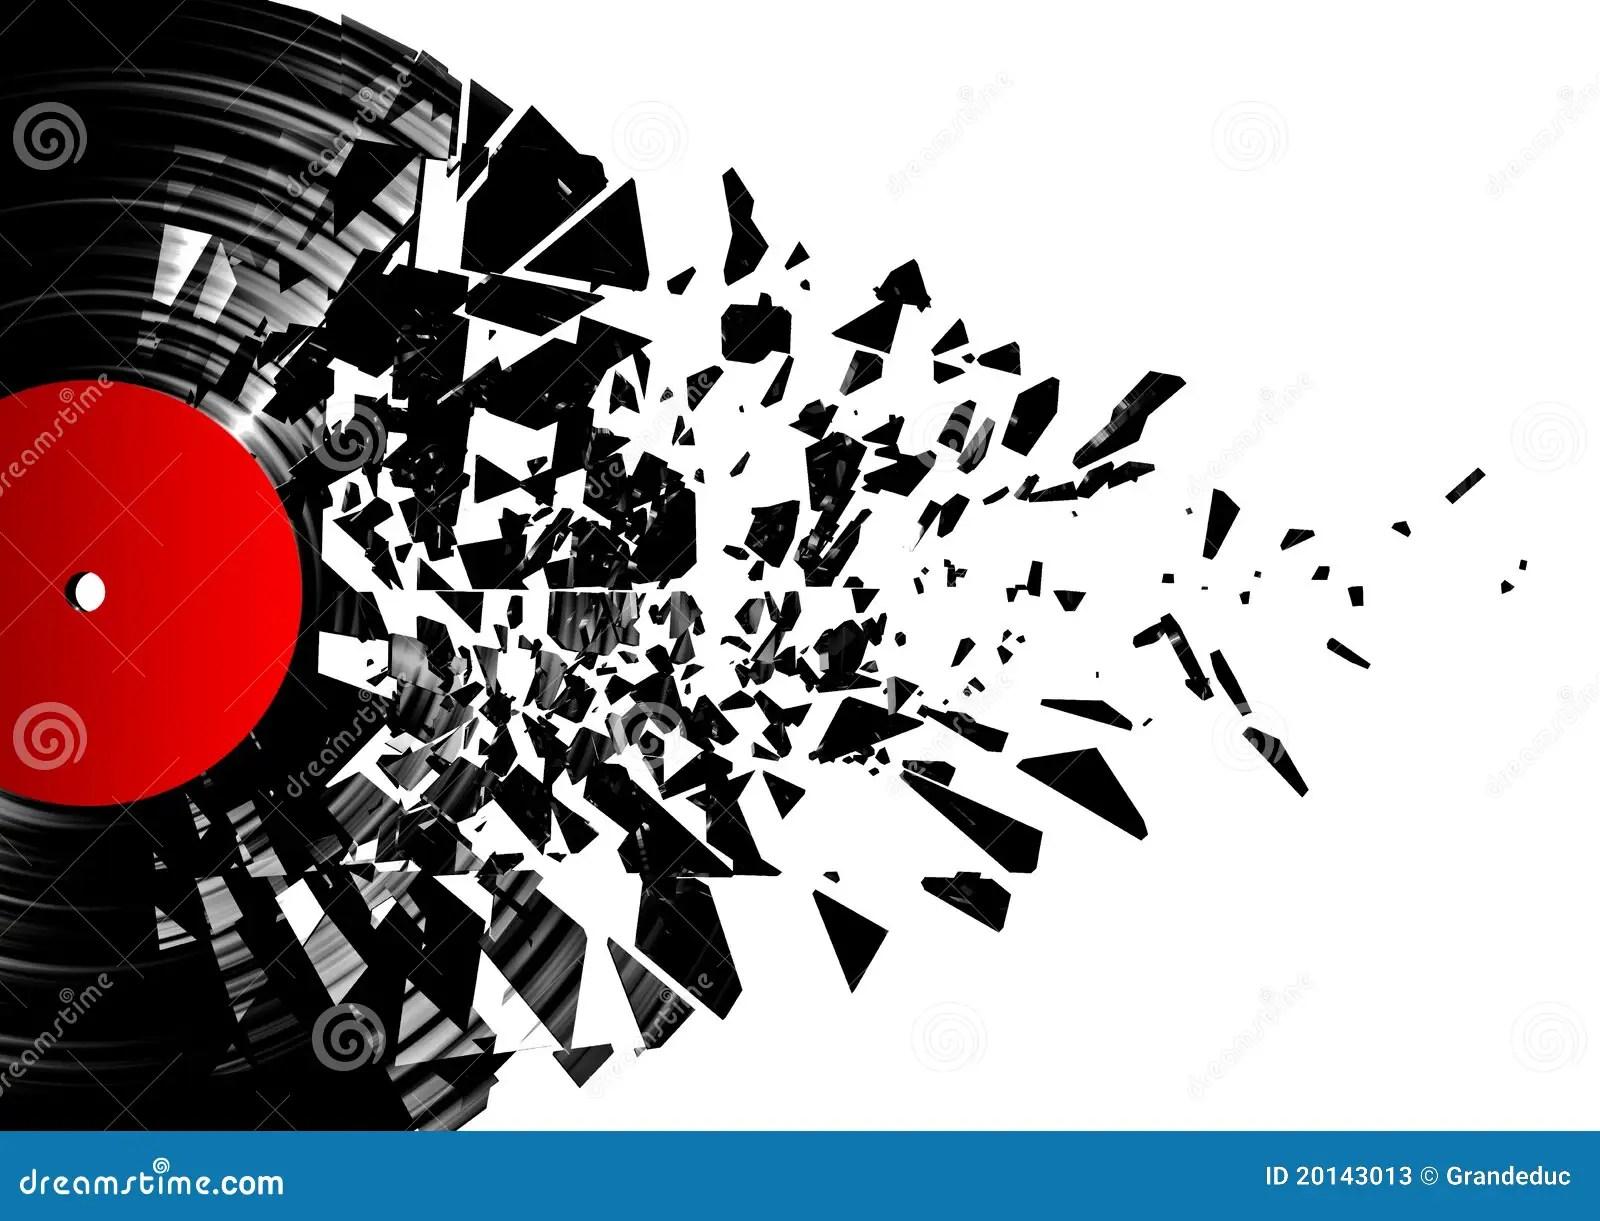 3d Vinyl Records Wallpaper Vinyl Shatter Stock Photos Image 20143013